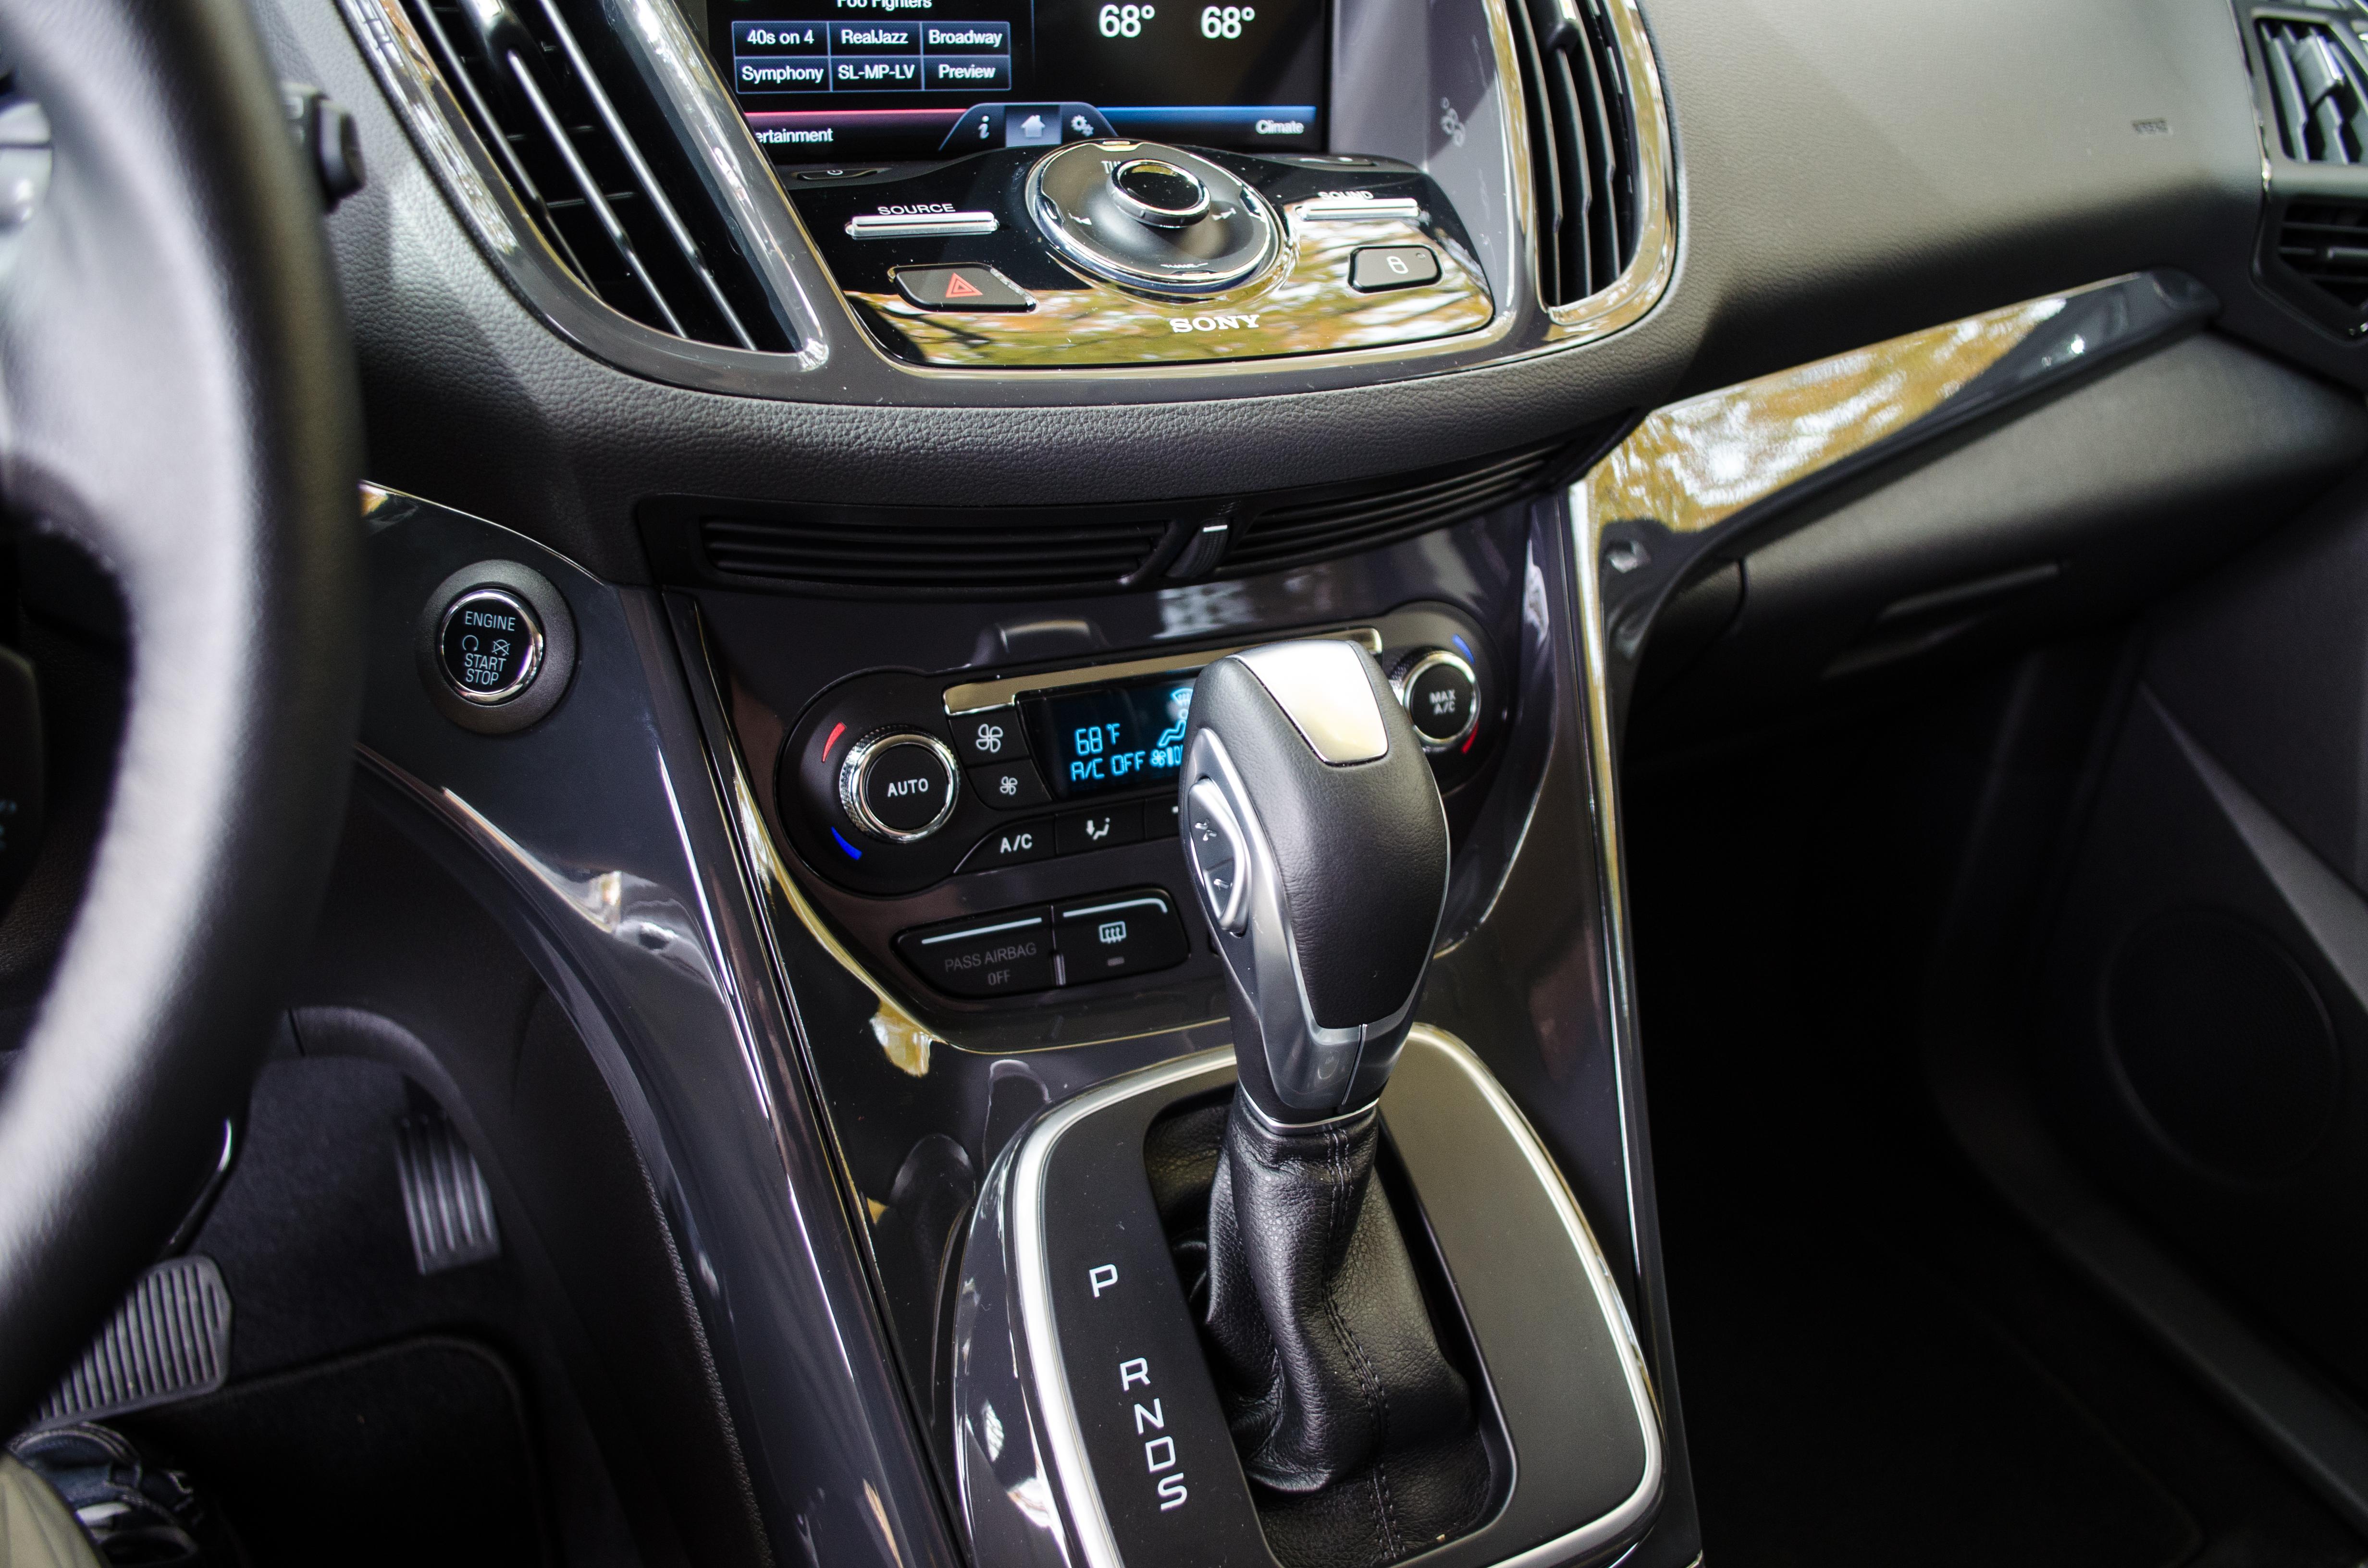 2014 Ford Escape Titanium 28 of 34  Motor Review